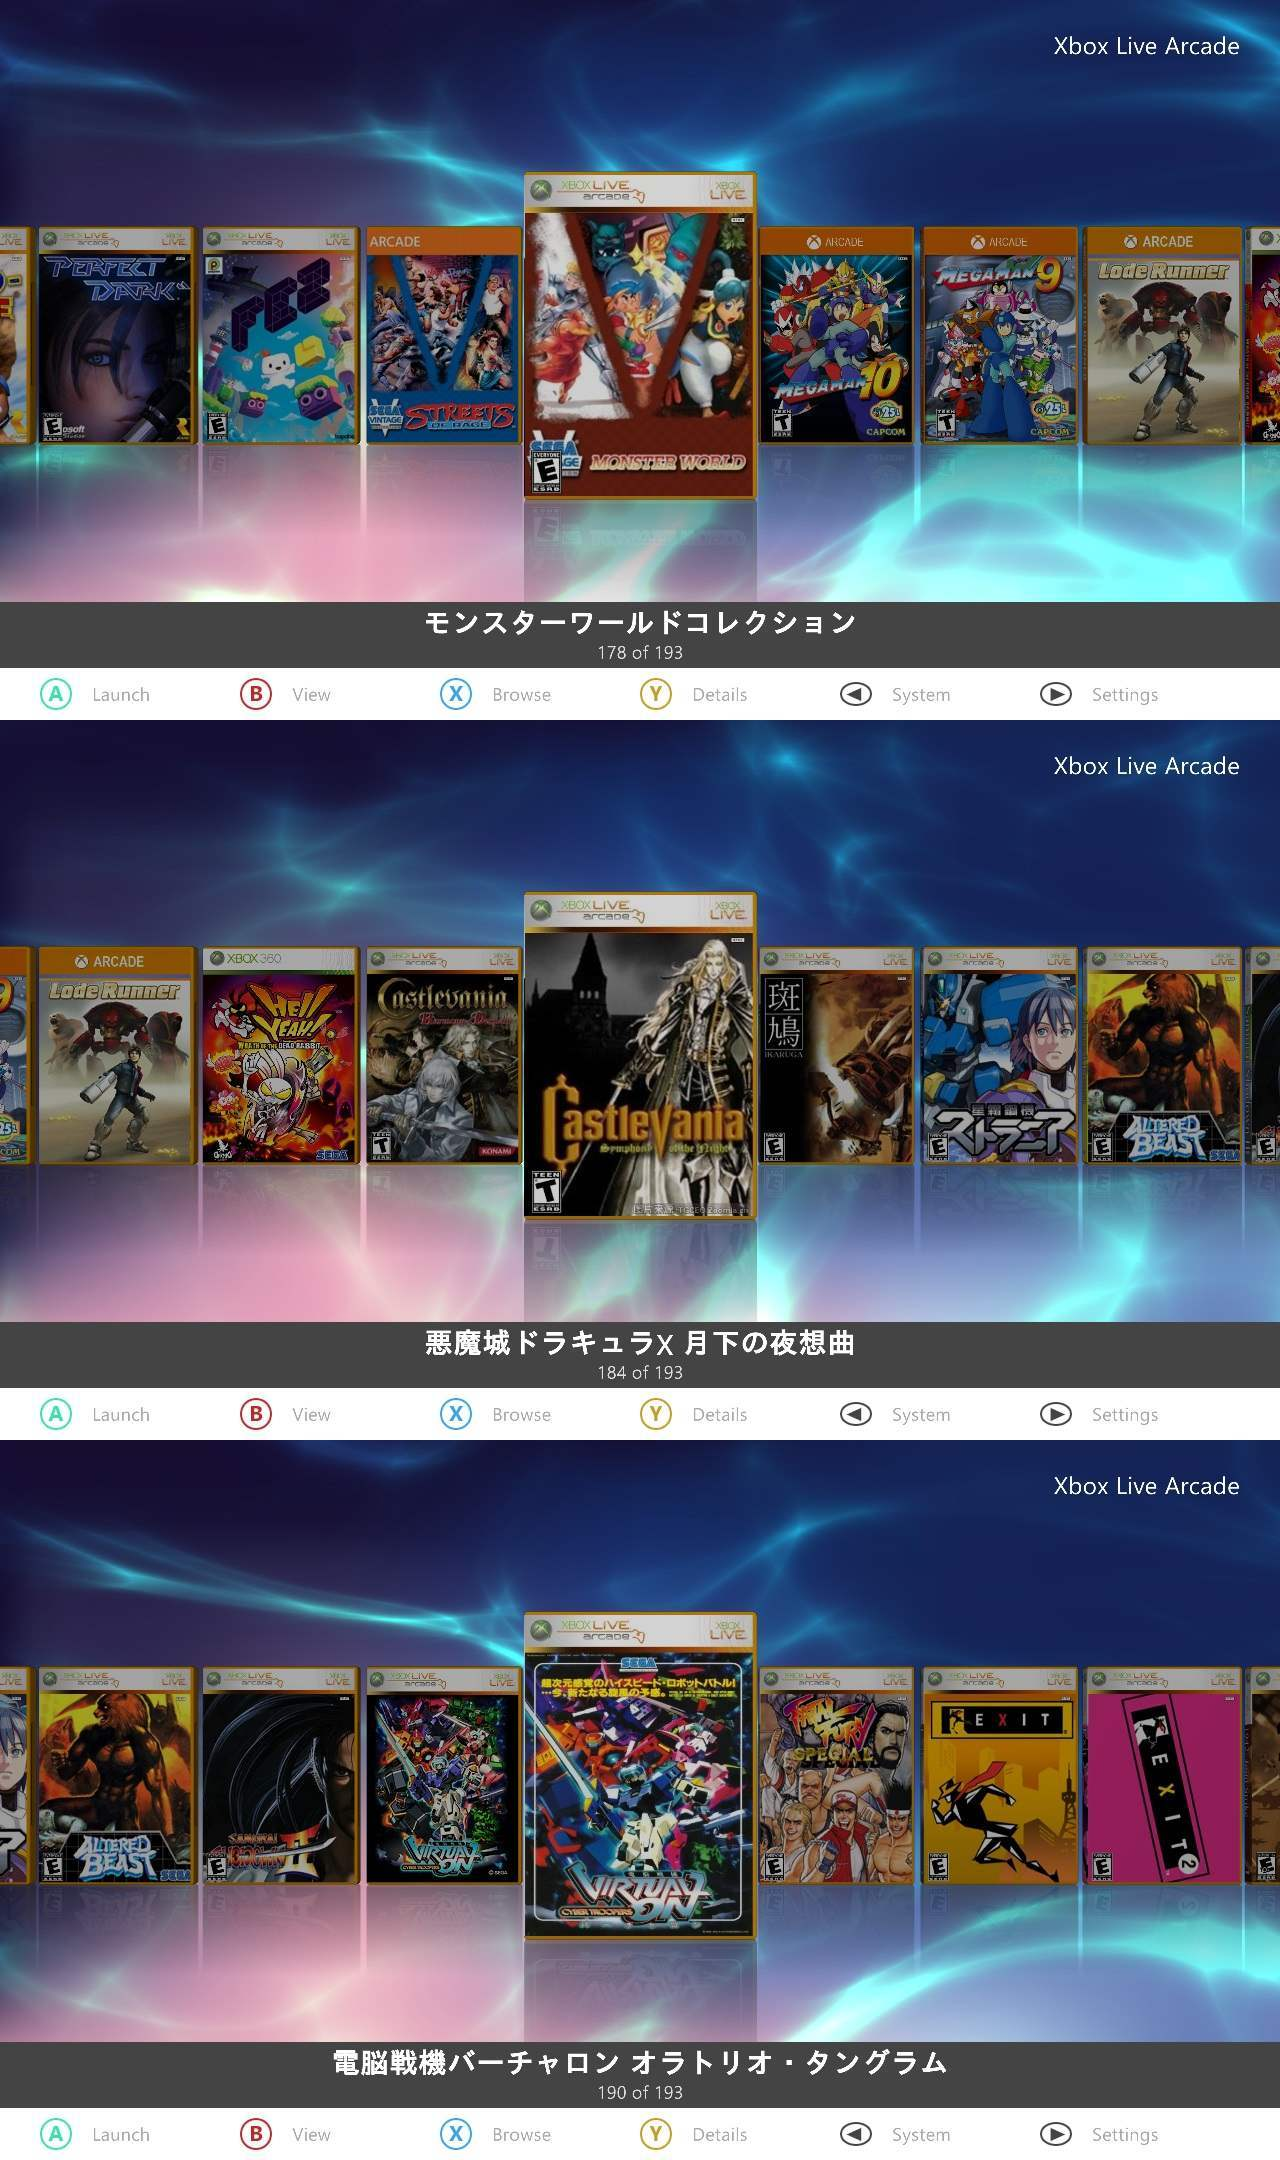 Aurora説明ページ xbox360(83) XBLA(193) Xbox Classic(20)_e0409300_17041758.jpg